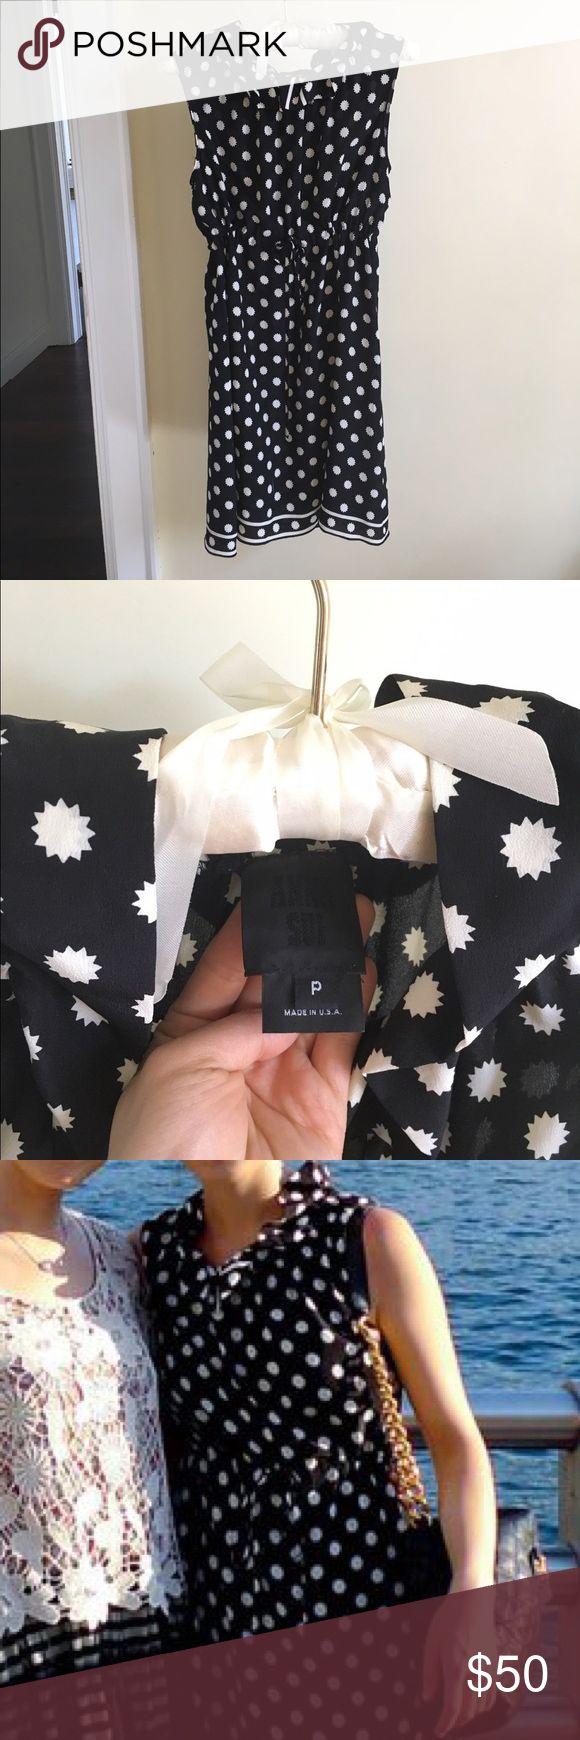 Anna Sui Dot Silk Dress Anna Sui Silk Dot Dress; very flattering style; above knee length Anna Sui Dresses